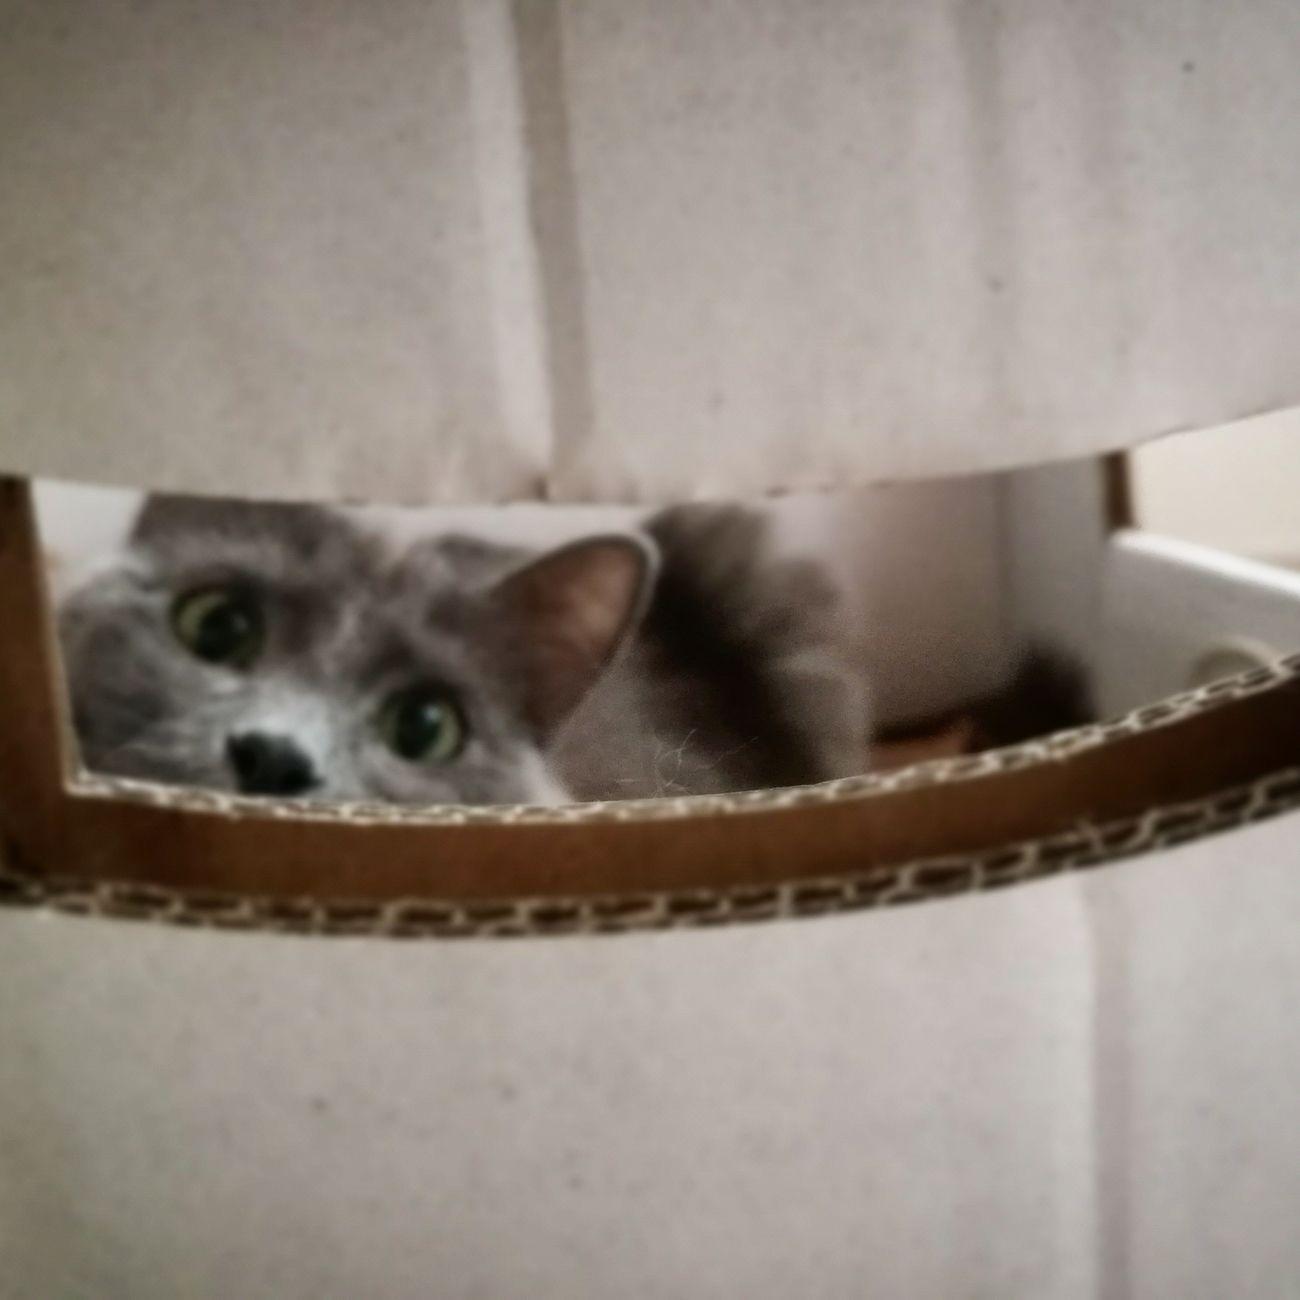 Milu Cat One Animal Pets Indoors  Animal Themes Domestic Animals Girl Gato Cats Babycat Greycat No People Mammal Day